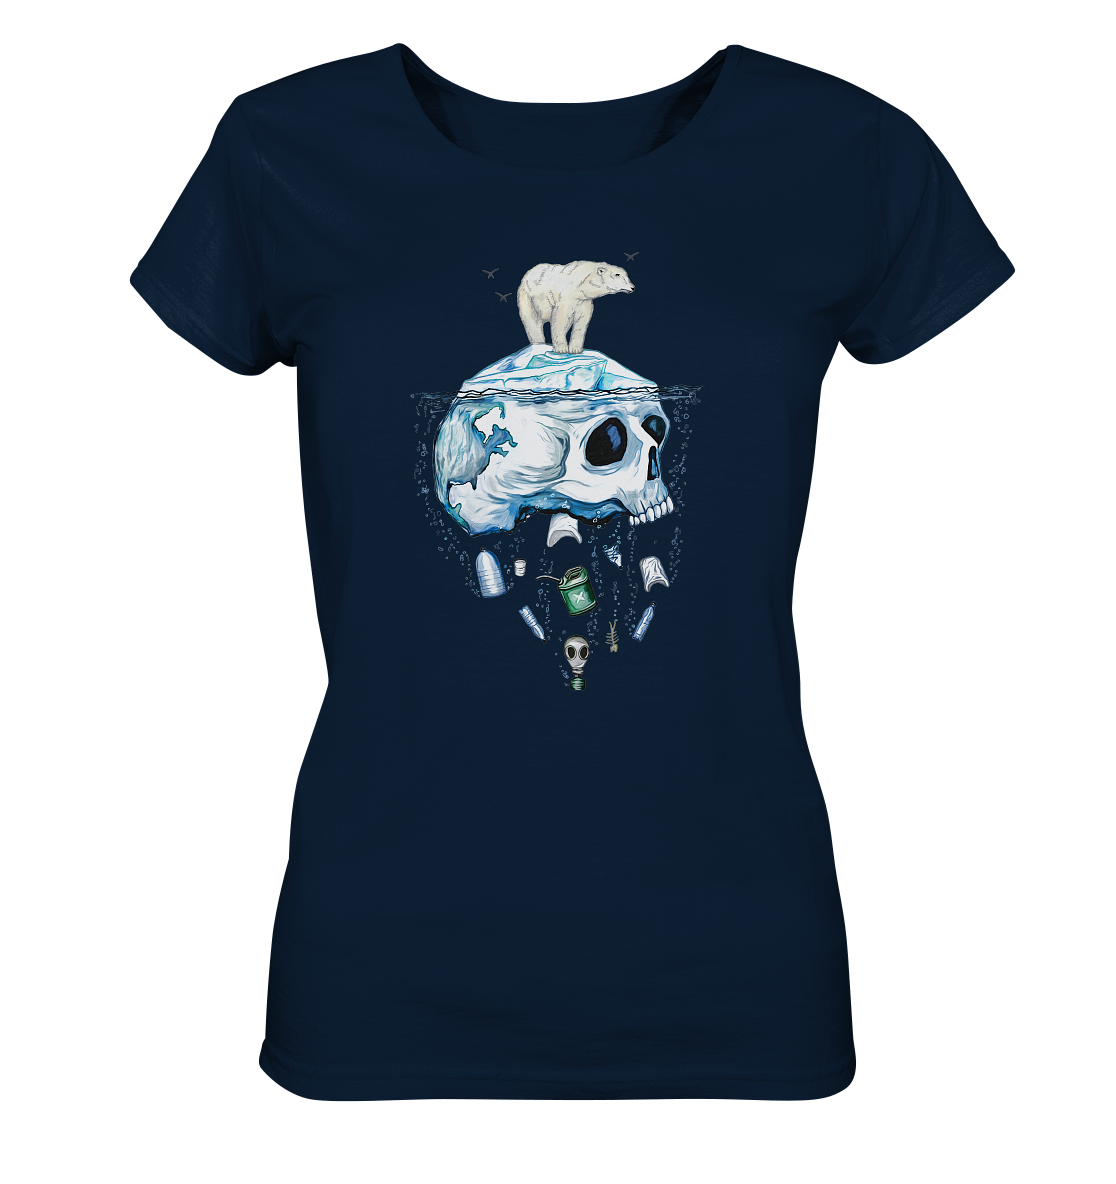 front-ladies-organic-shirt-0e2035-1116x.png